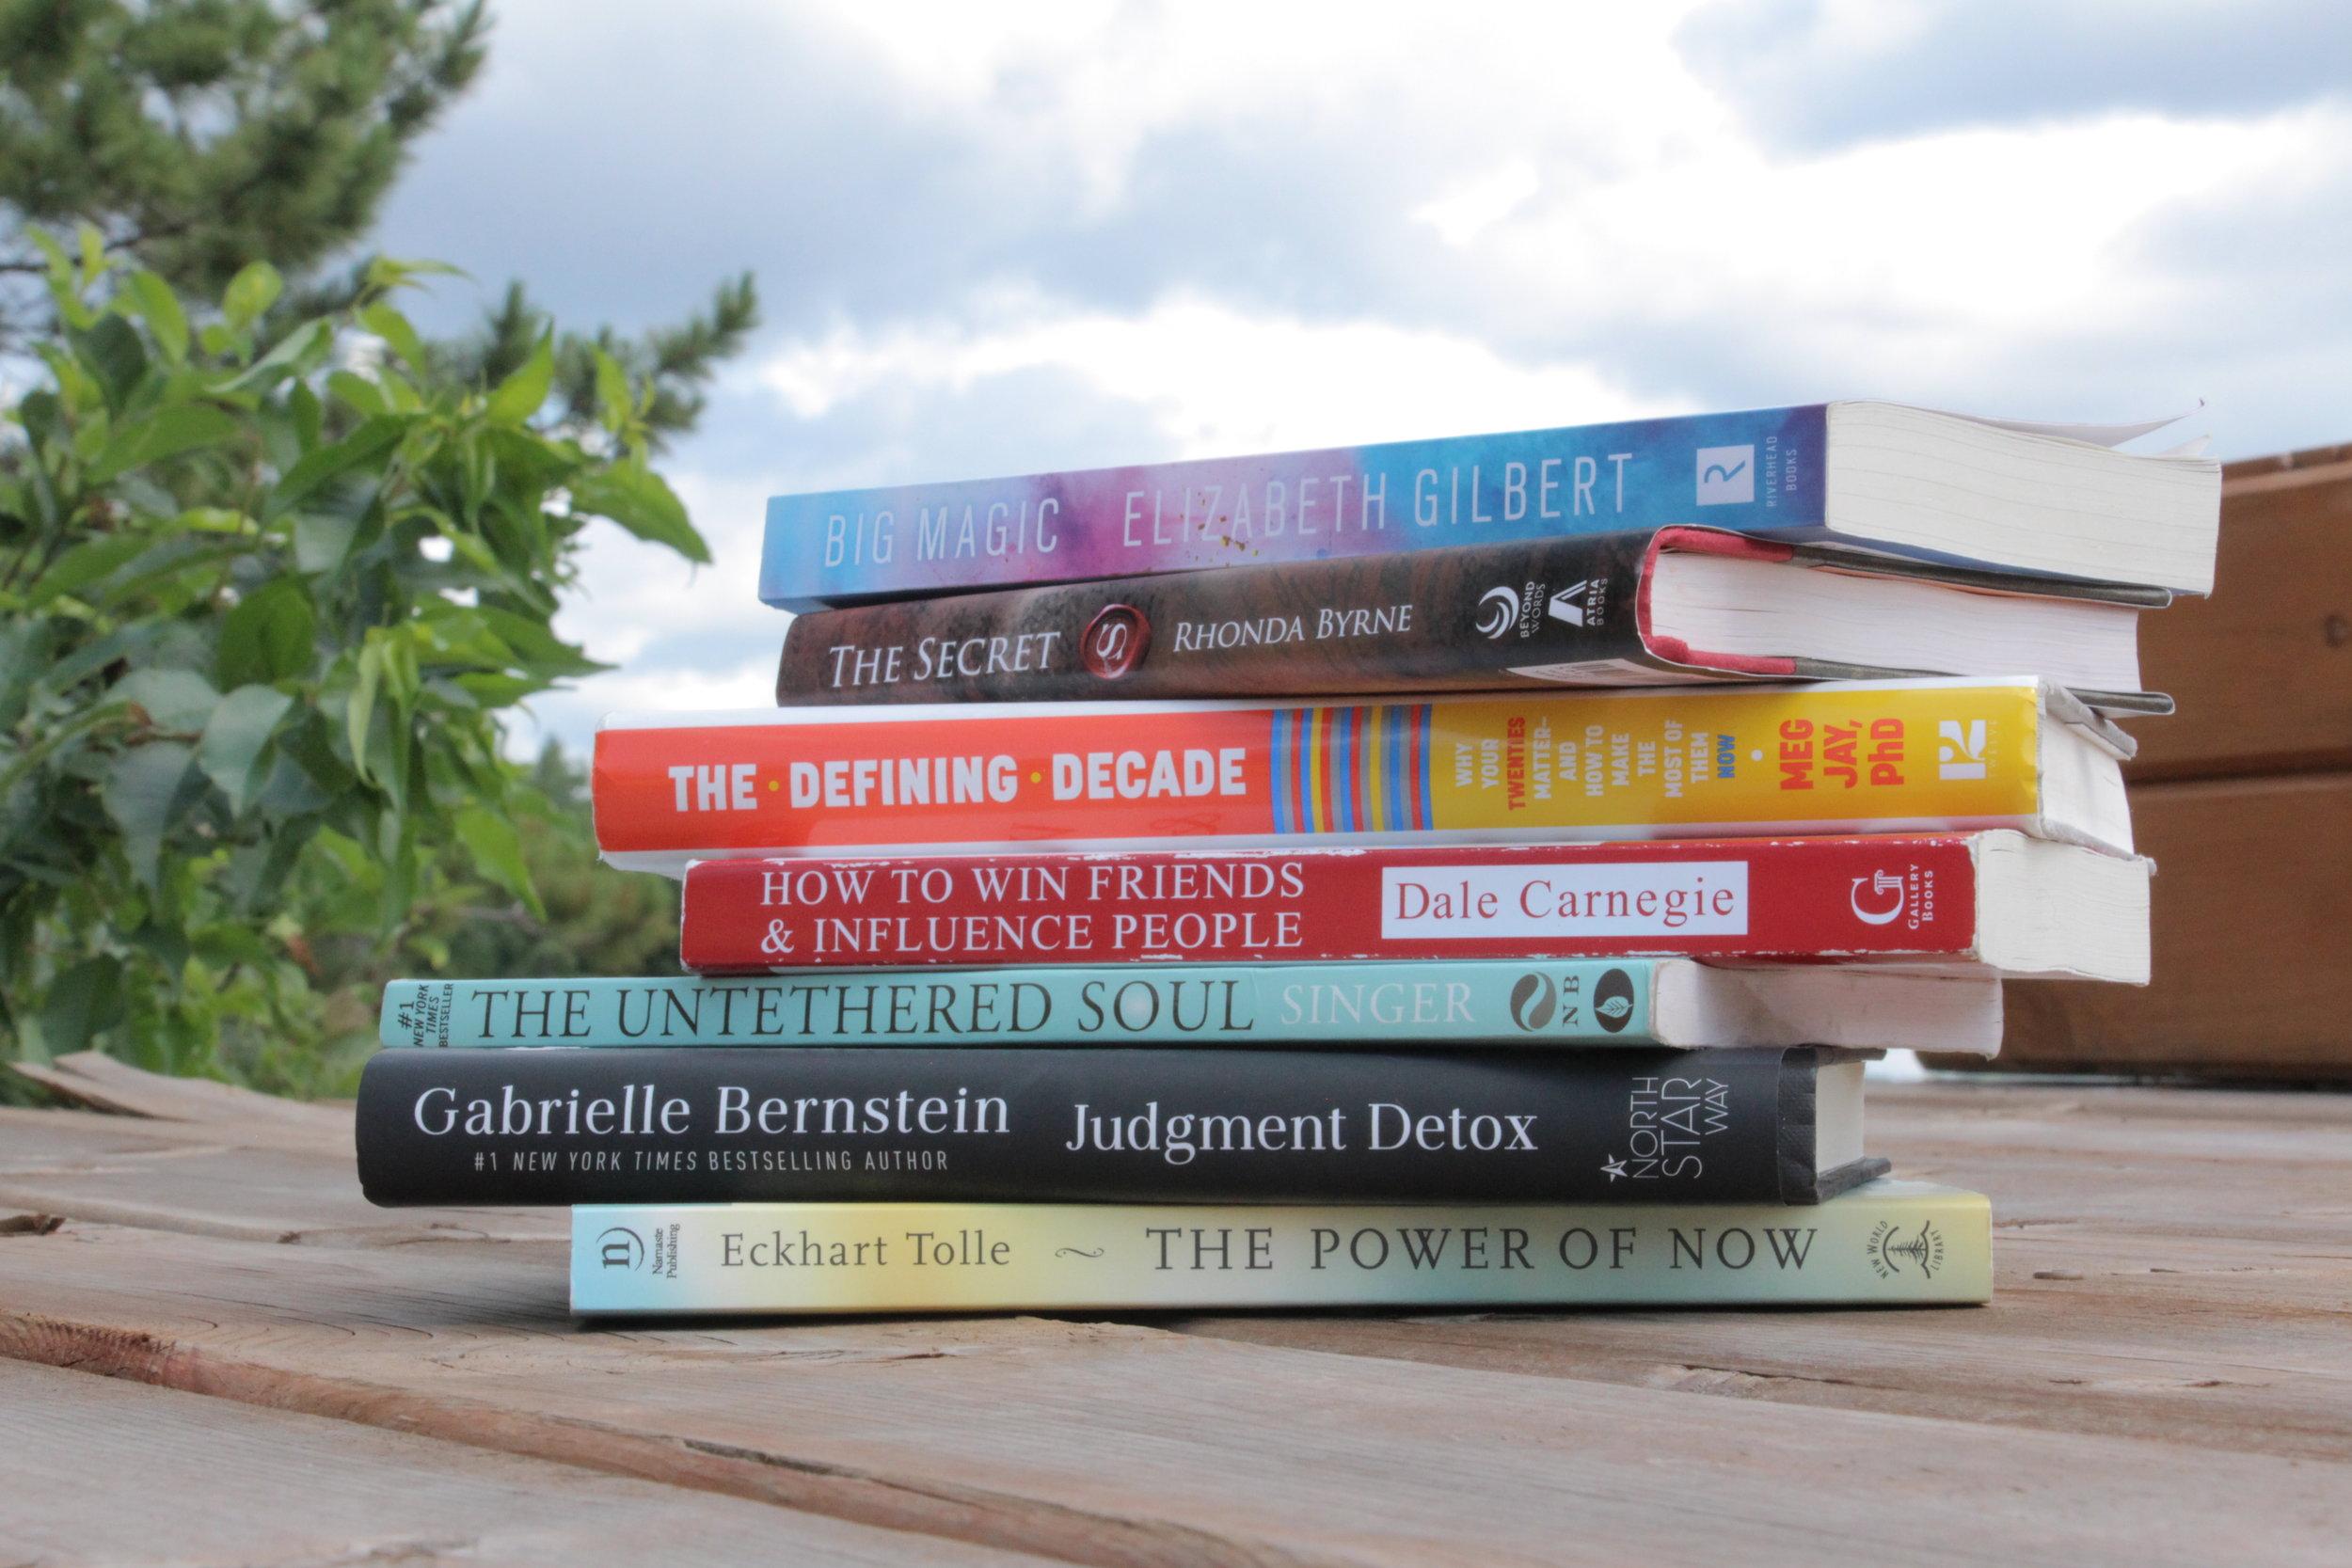 Sam+D+Squire+_+Self-Development+_+Books+Reading.jpeg